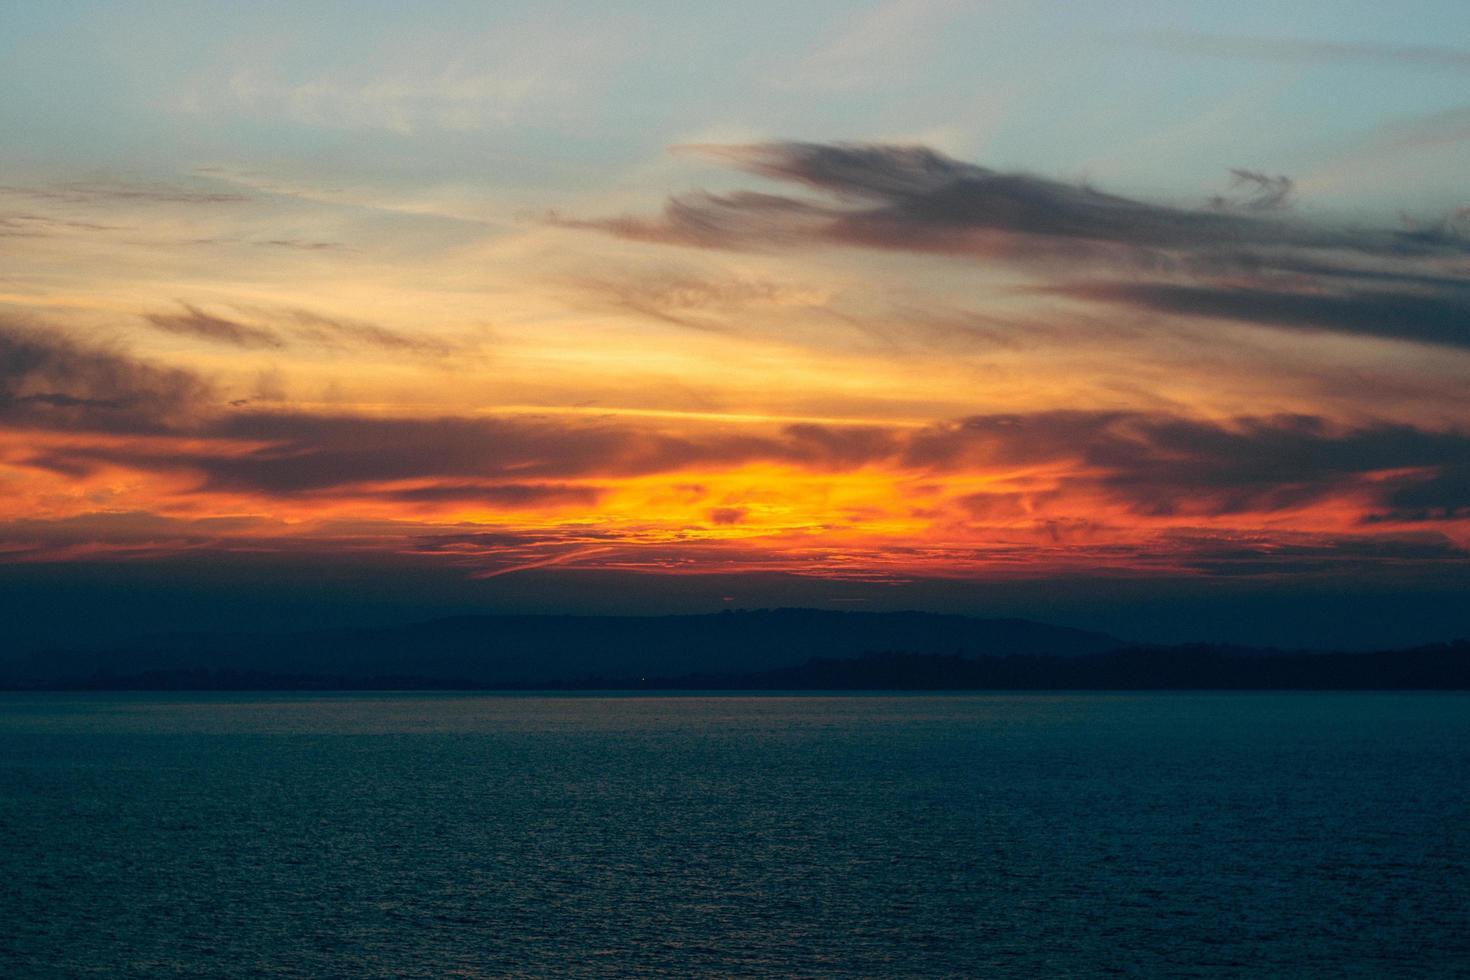 Sonnenuntergang vom Strand foto